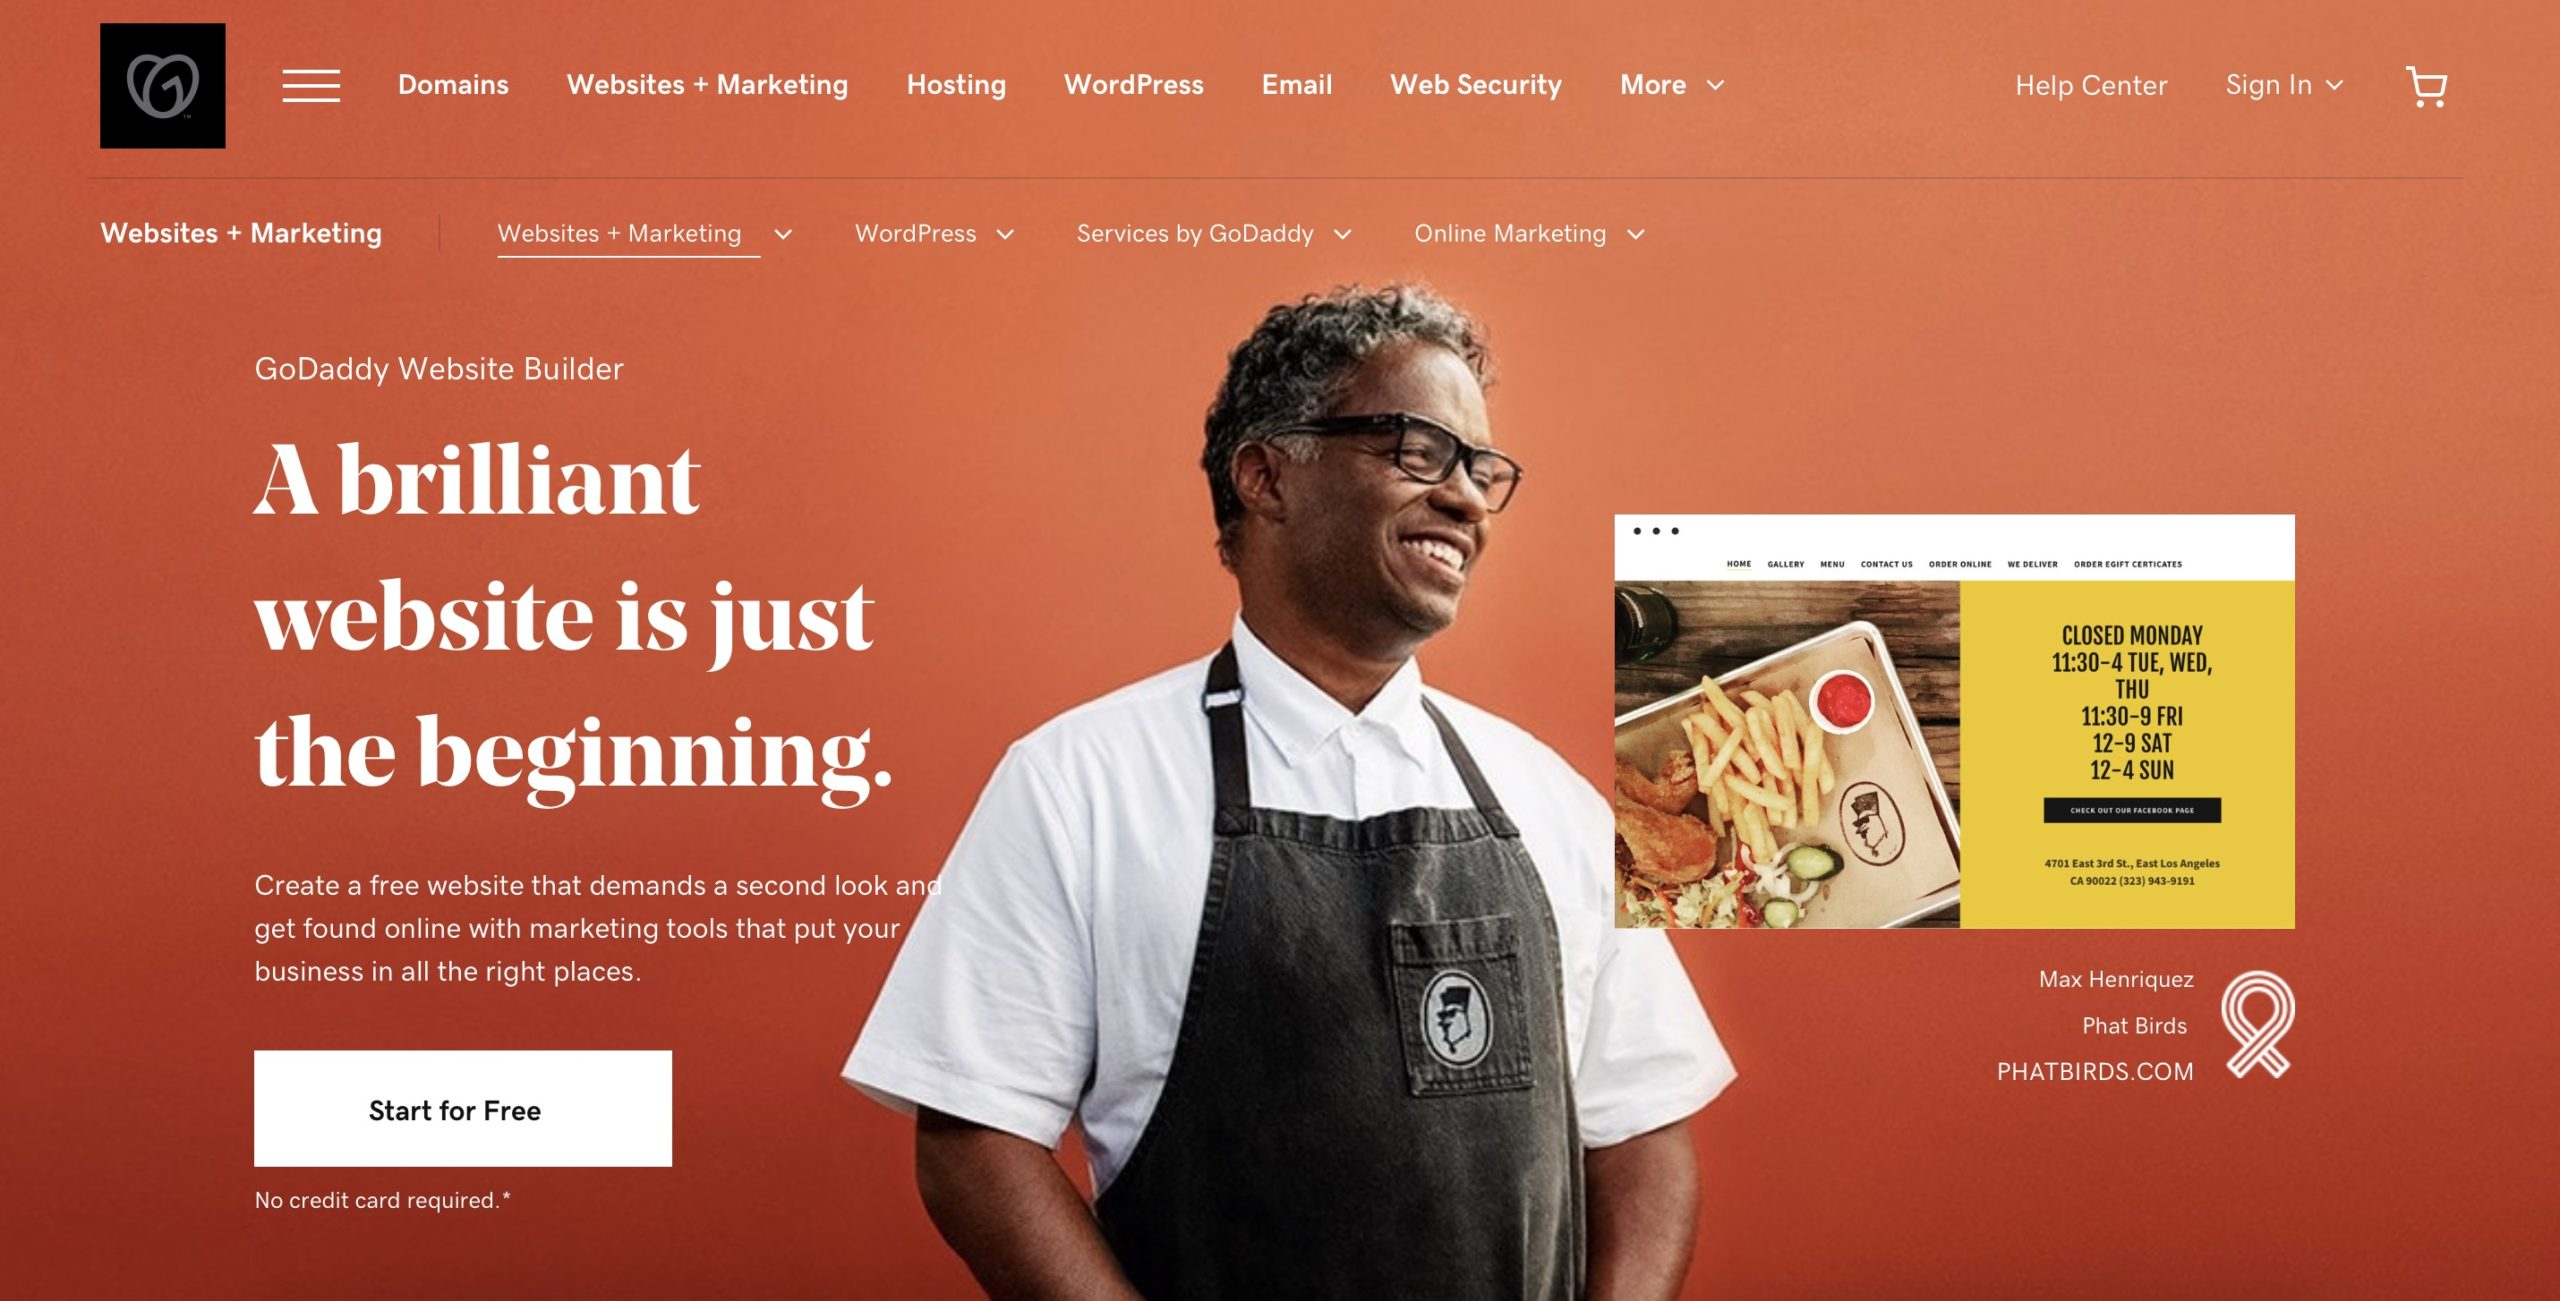 GoDaddy website builder homepage screenshot